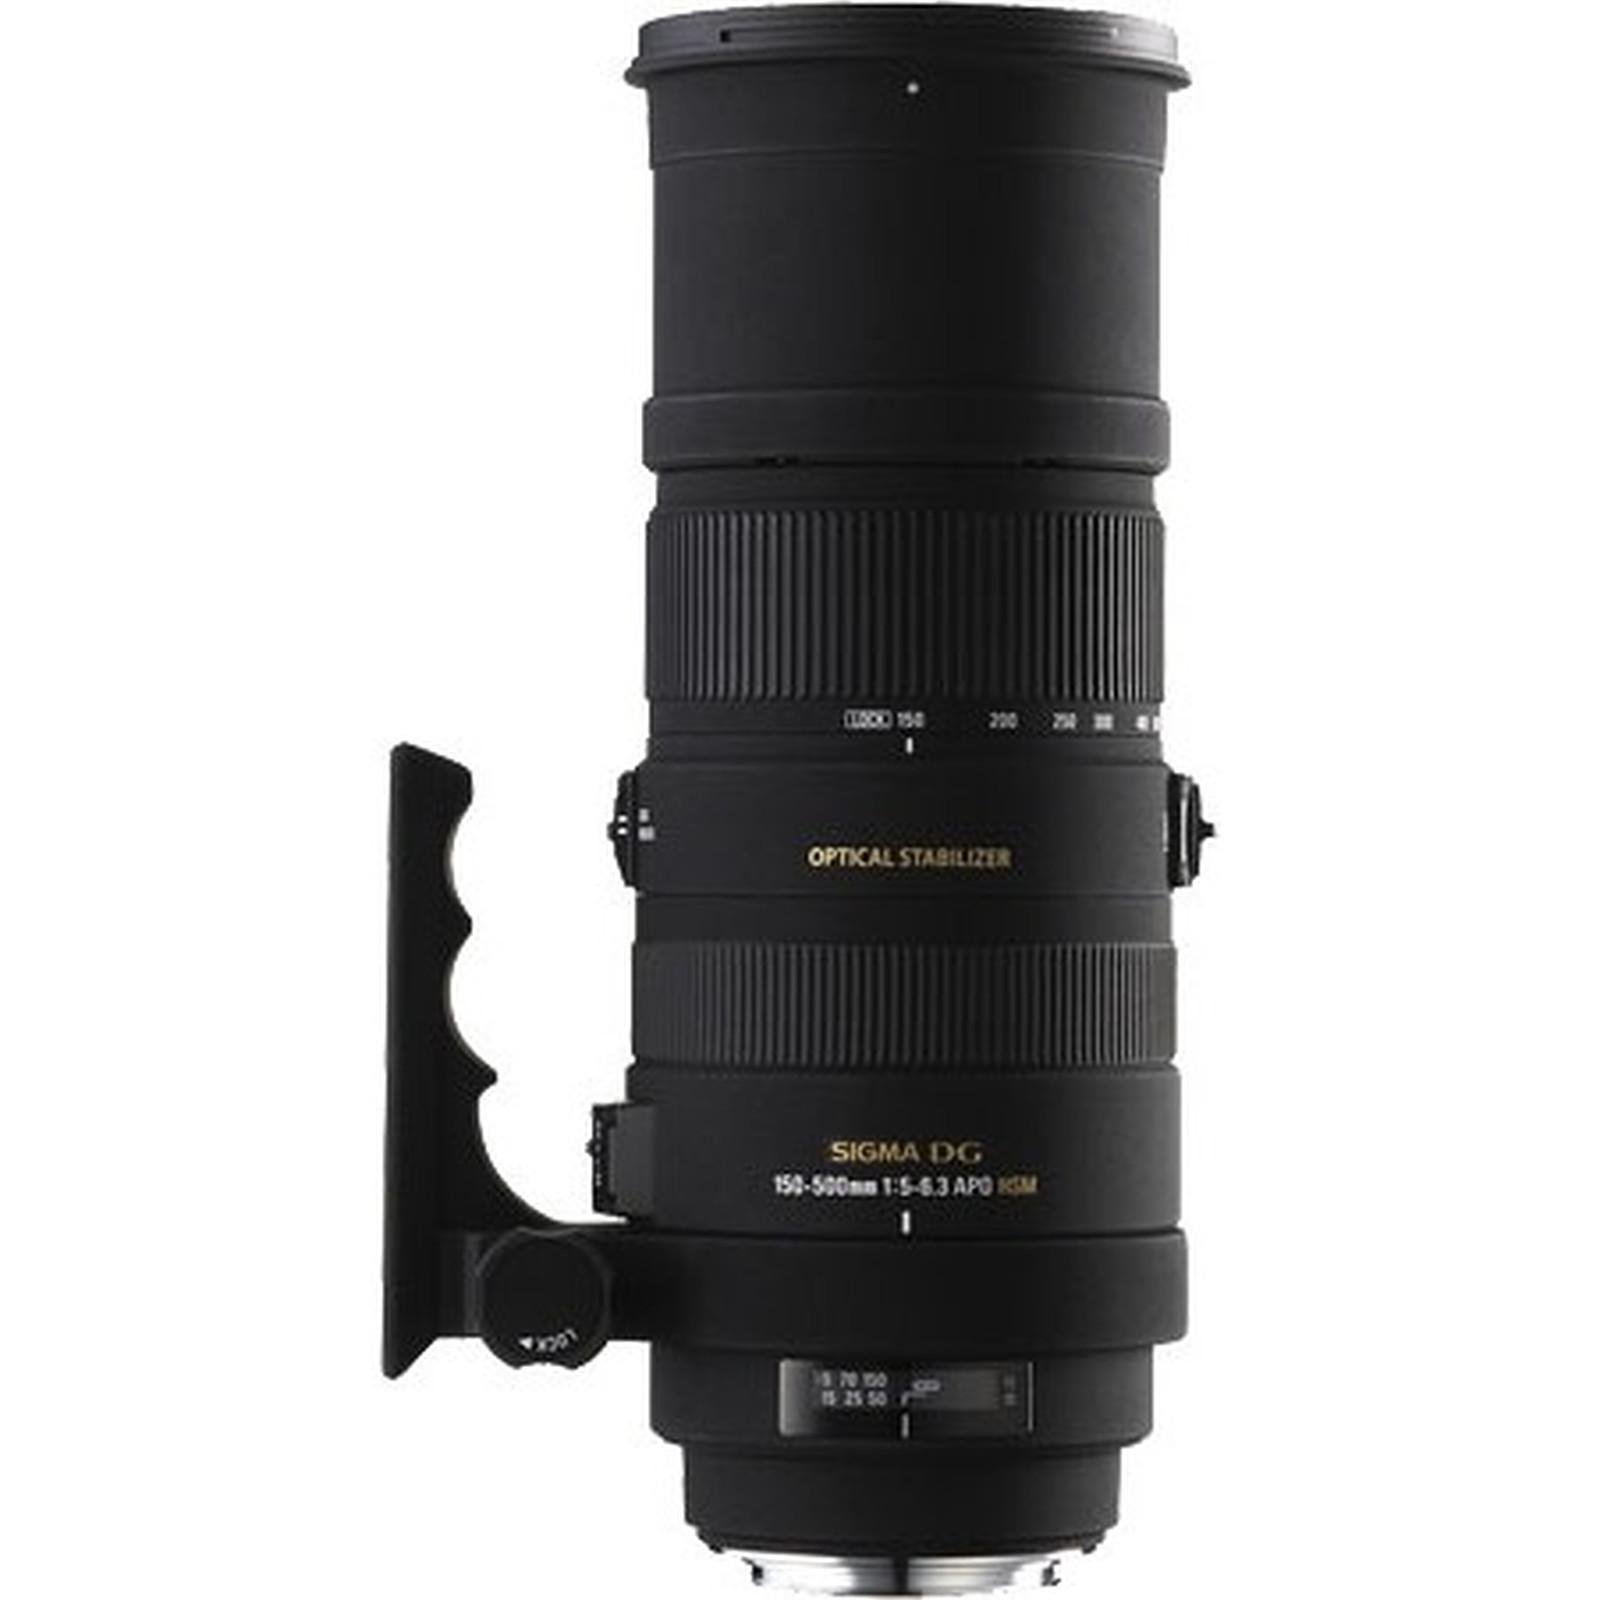 Monture F5 6 3 Hsm Objectif Dg Os 500mm Sigma Apo 150 Nikon VqzSMUp